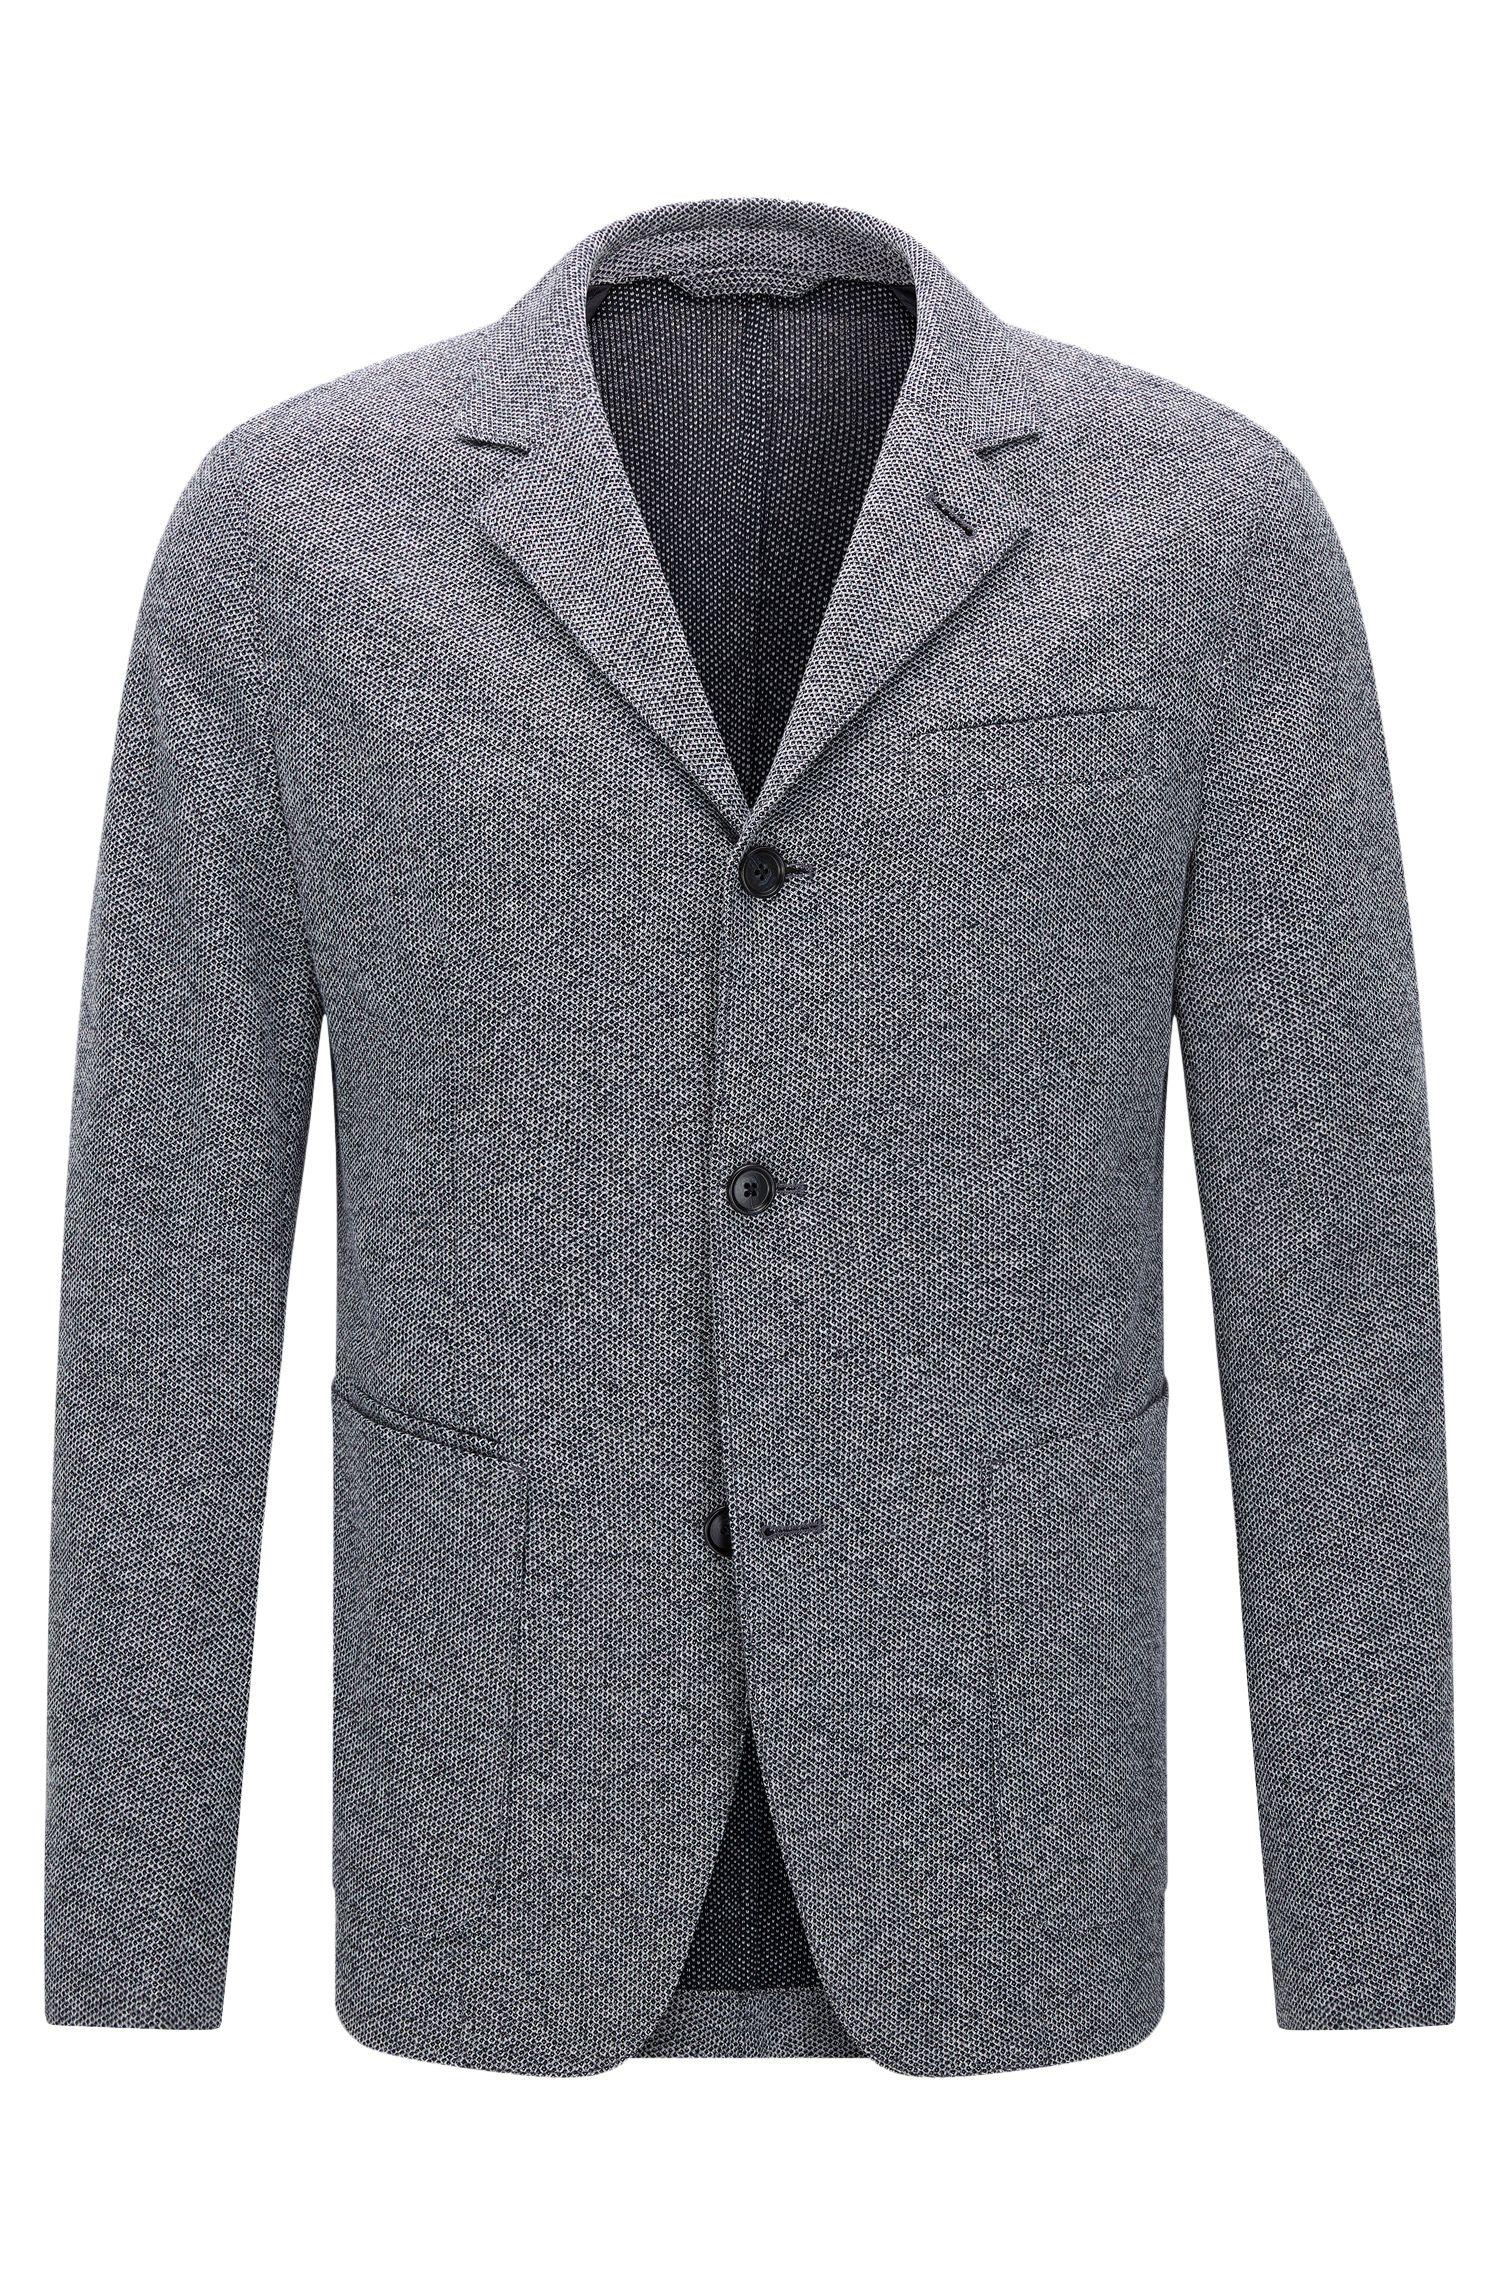 'T-Nedd' | Slim Fit, Italian Cotton Jersey Sport Coat